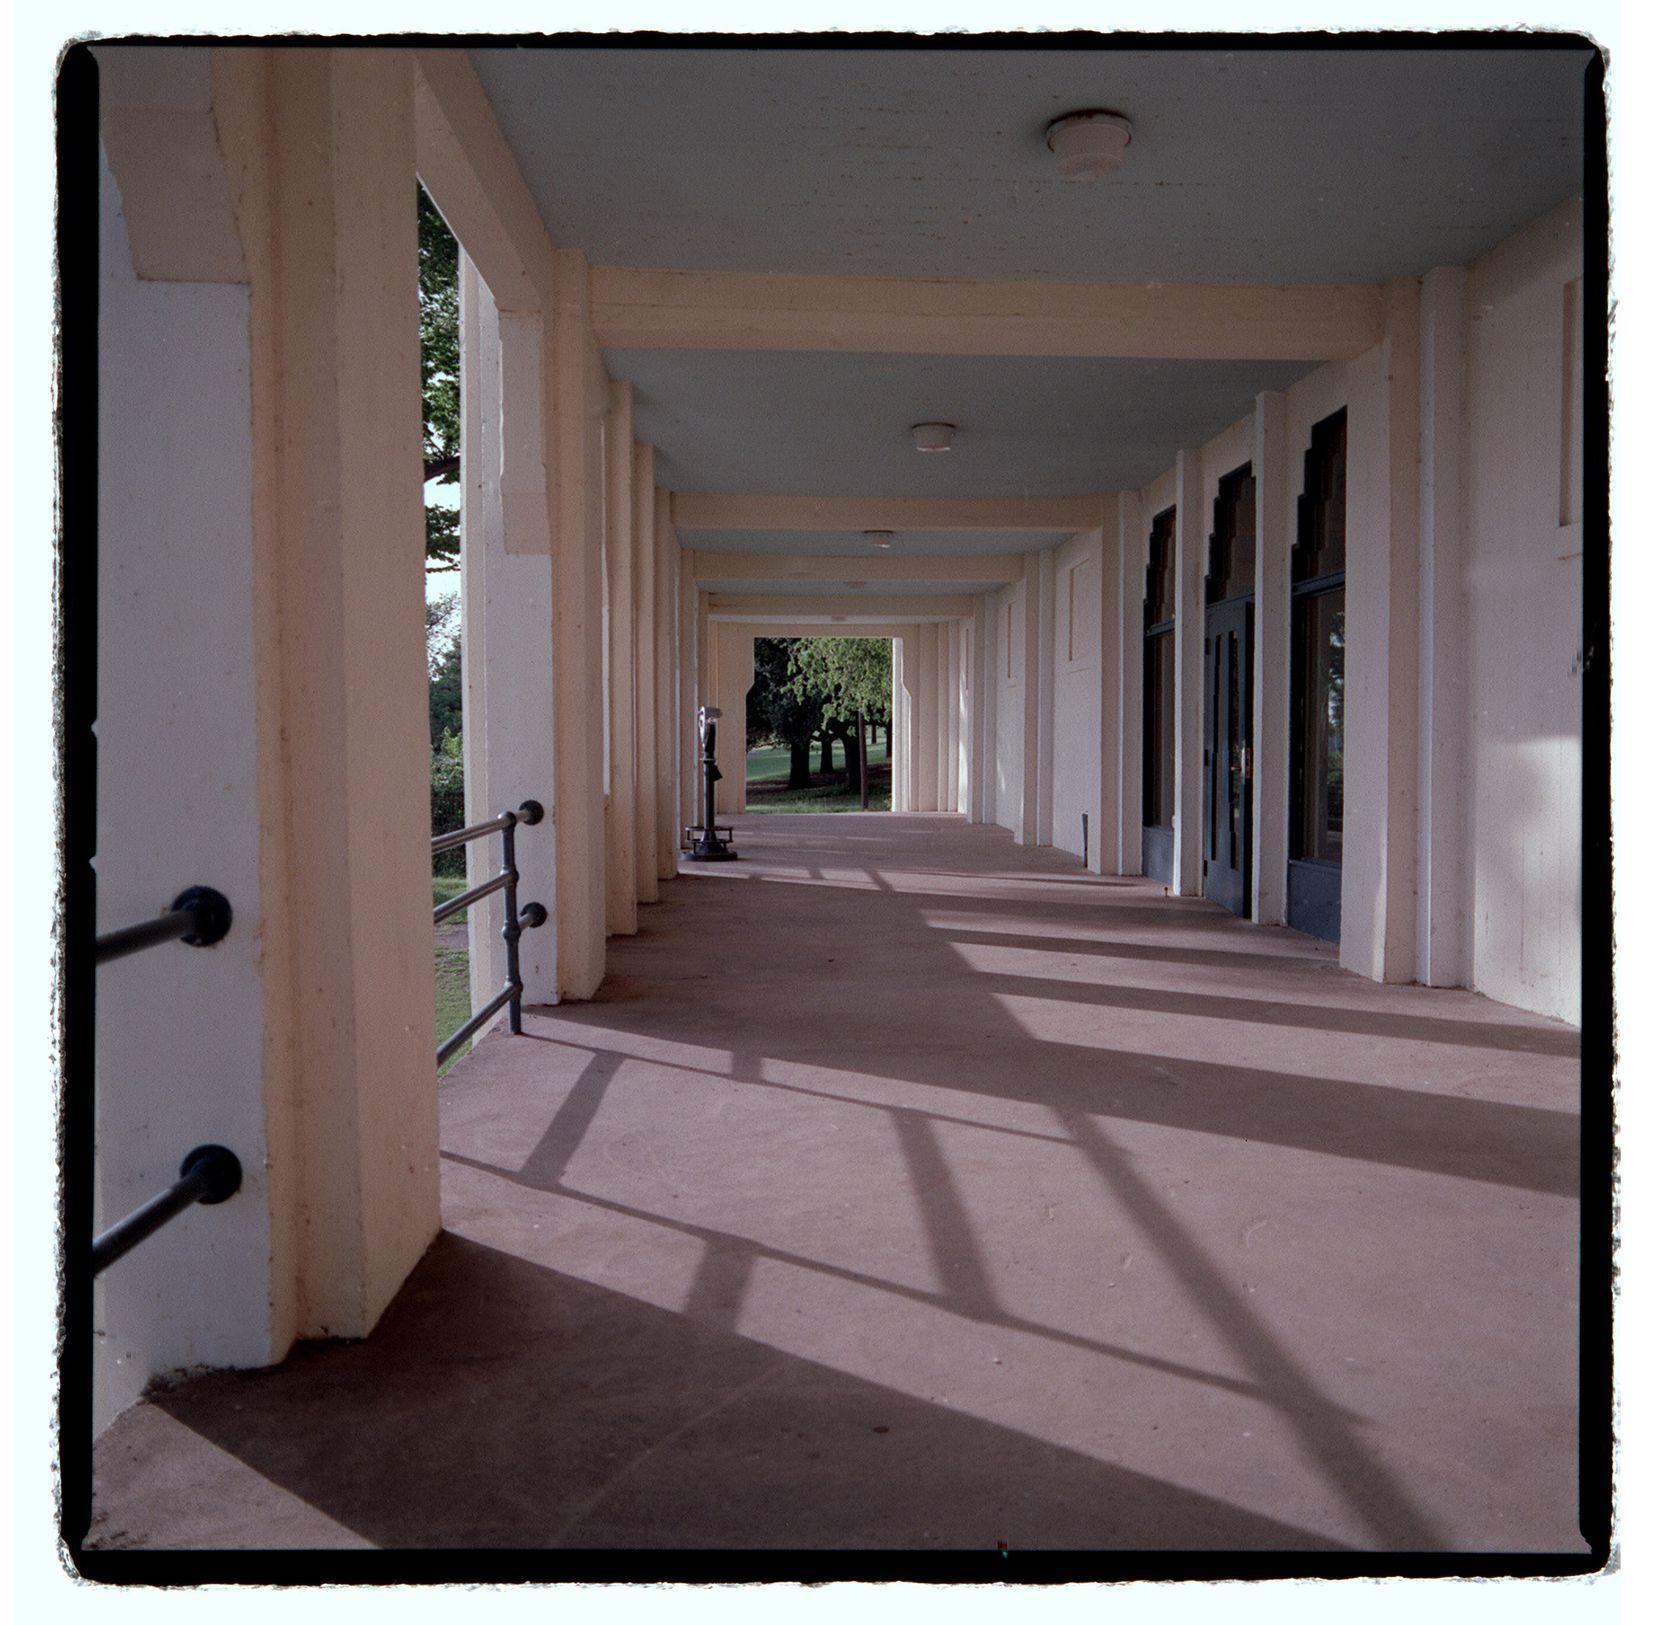 Veranda of the Bath House Cultural Center, which overlooks White Rock Lake.